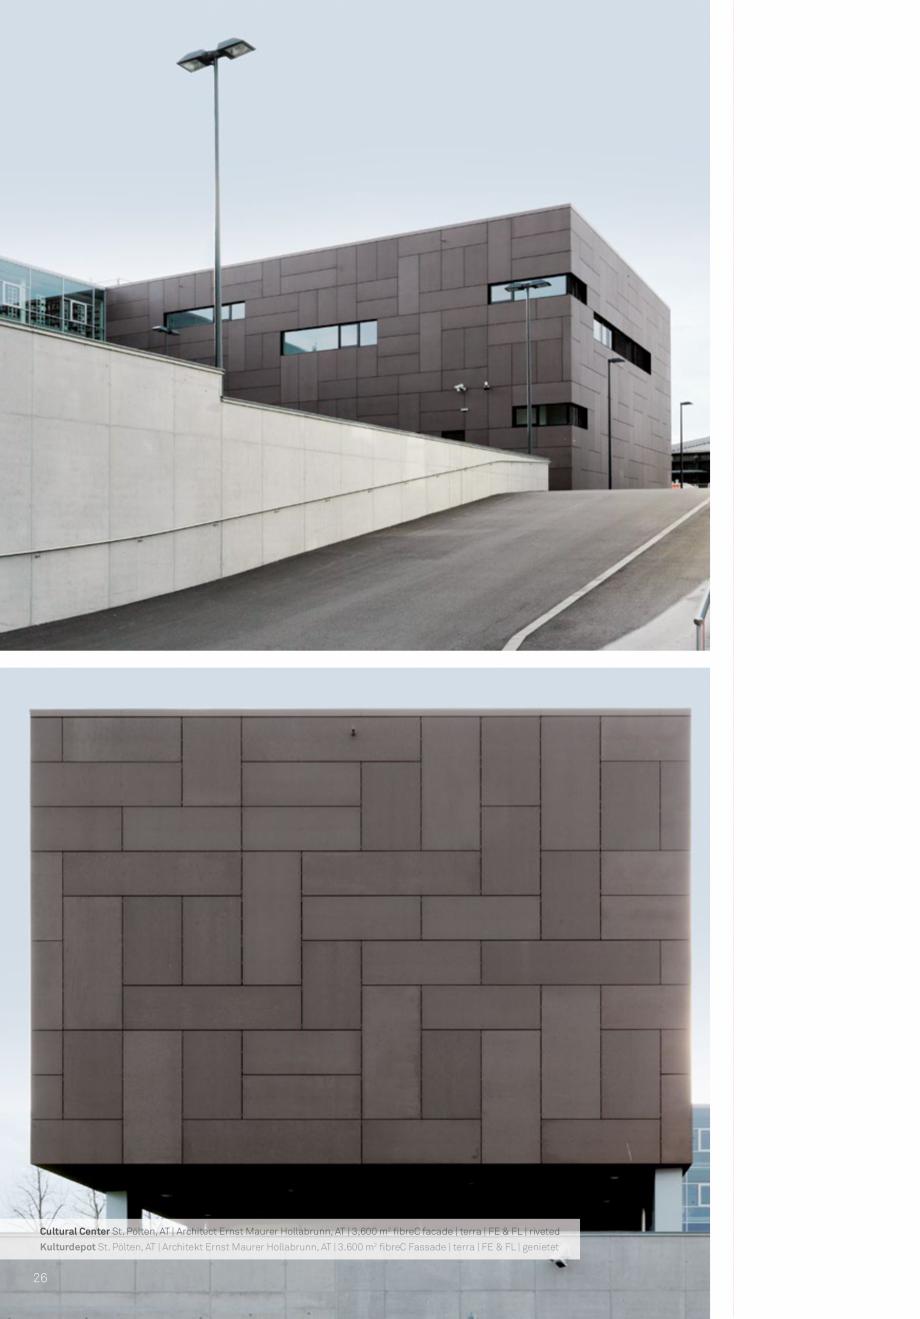 Pagina 28 - Panouri din beton aparent RIEDER Concrete Skin Lucrari, proiecte Engleza h Regionen und ...